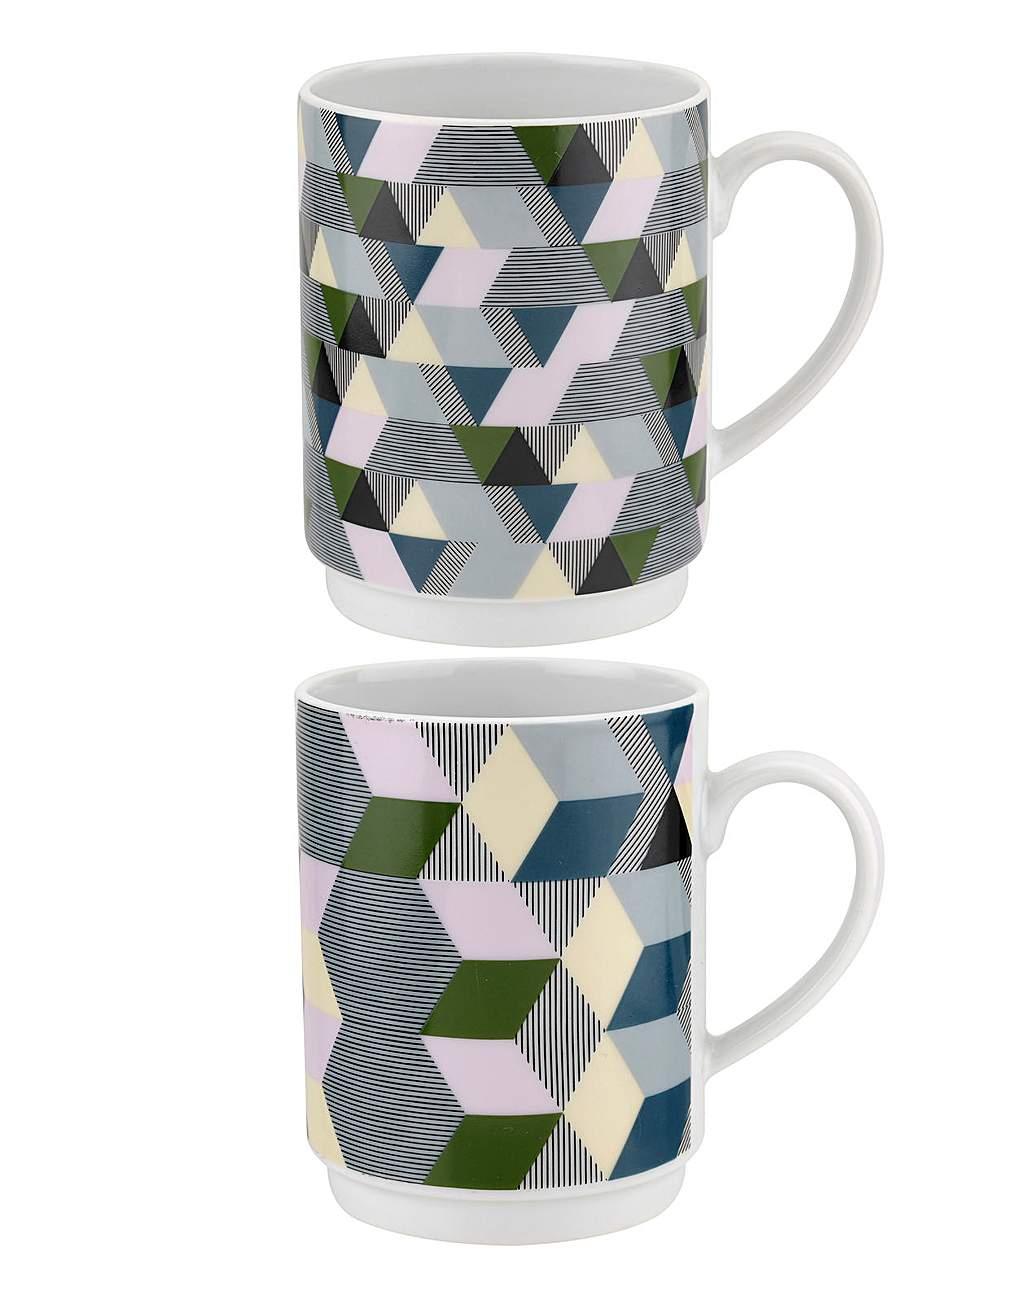 Portmeirion Geometrics Stacking Mugs Throughout Portmeirion Armchairs (View 13 of 15)